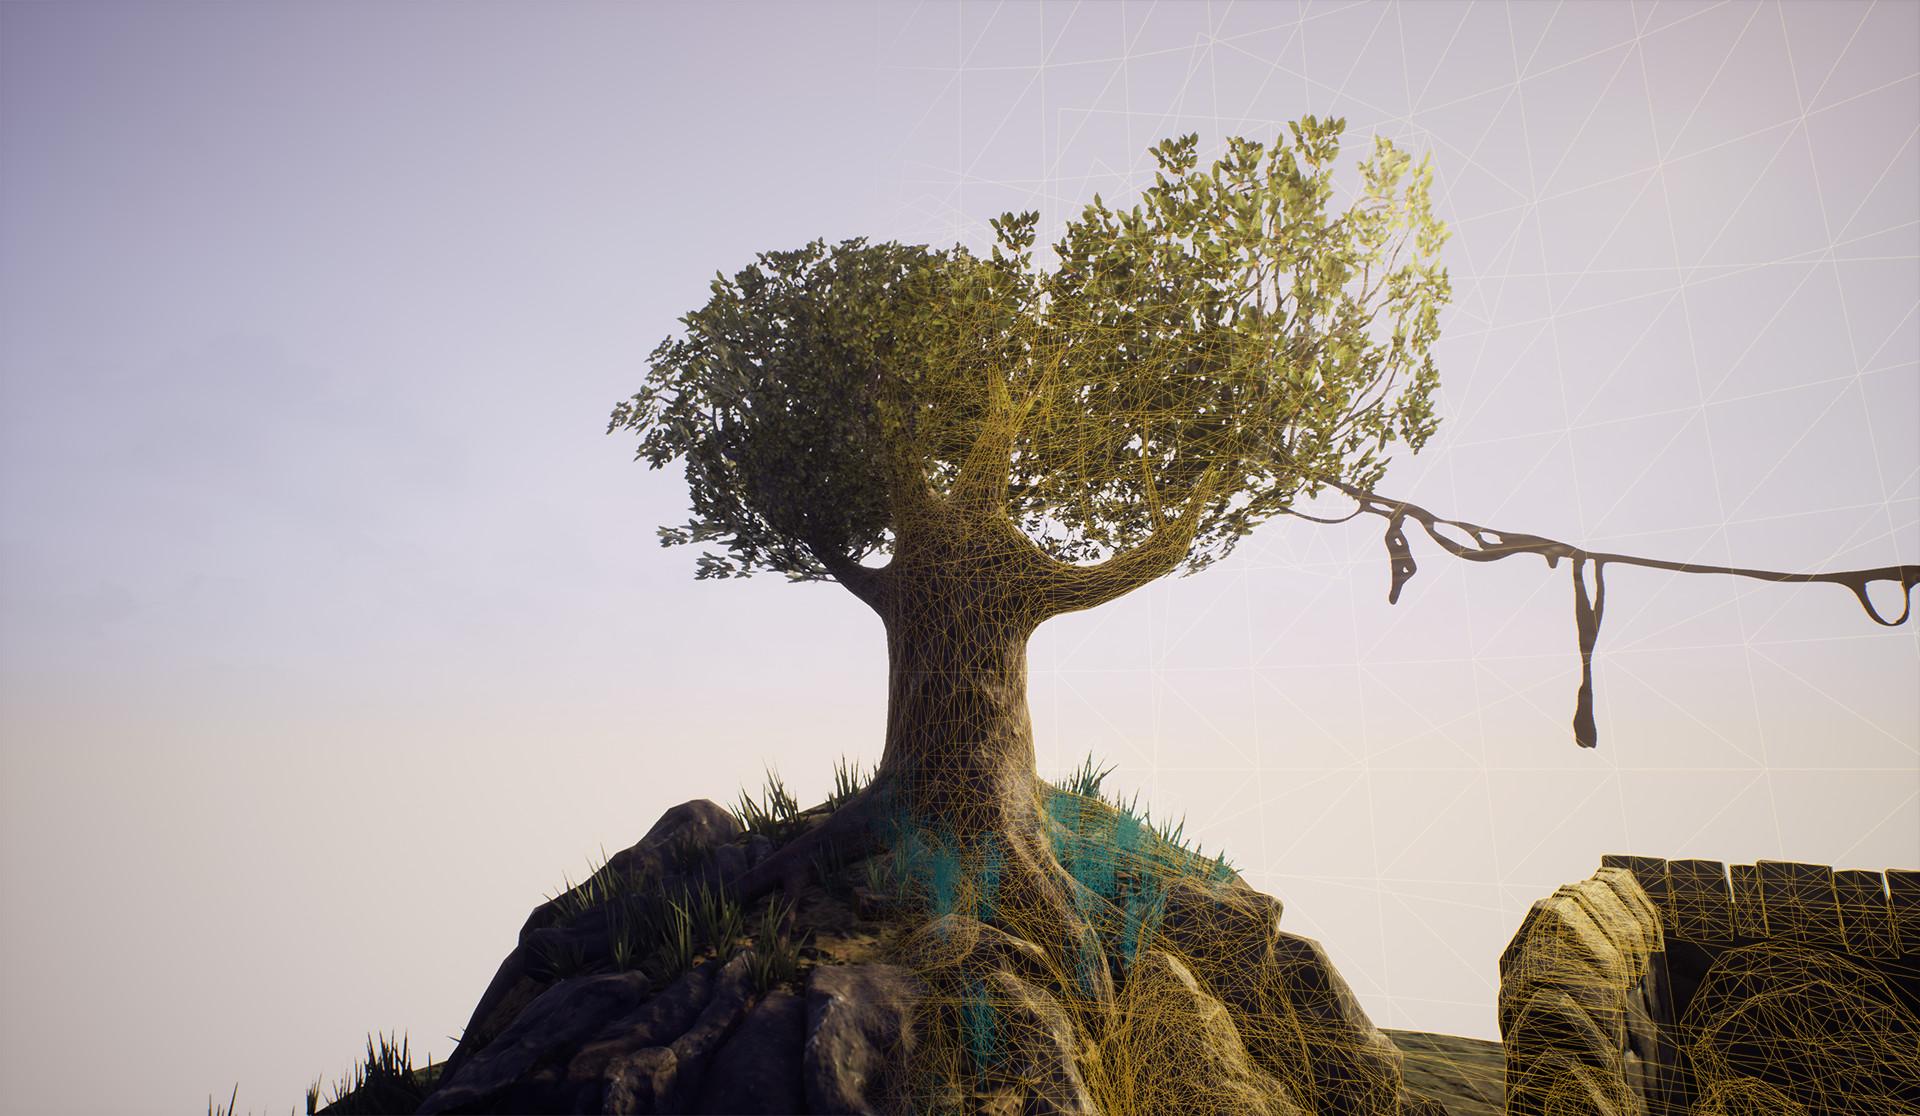 Ben macauley treeshot